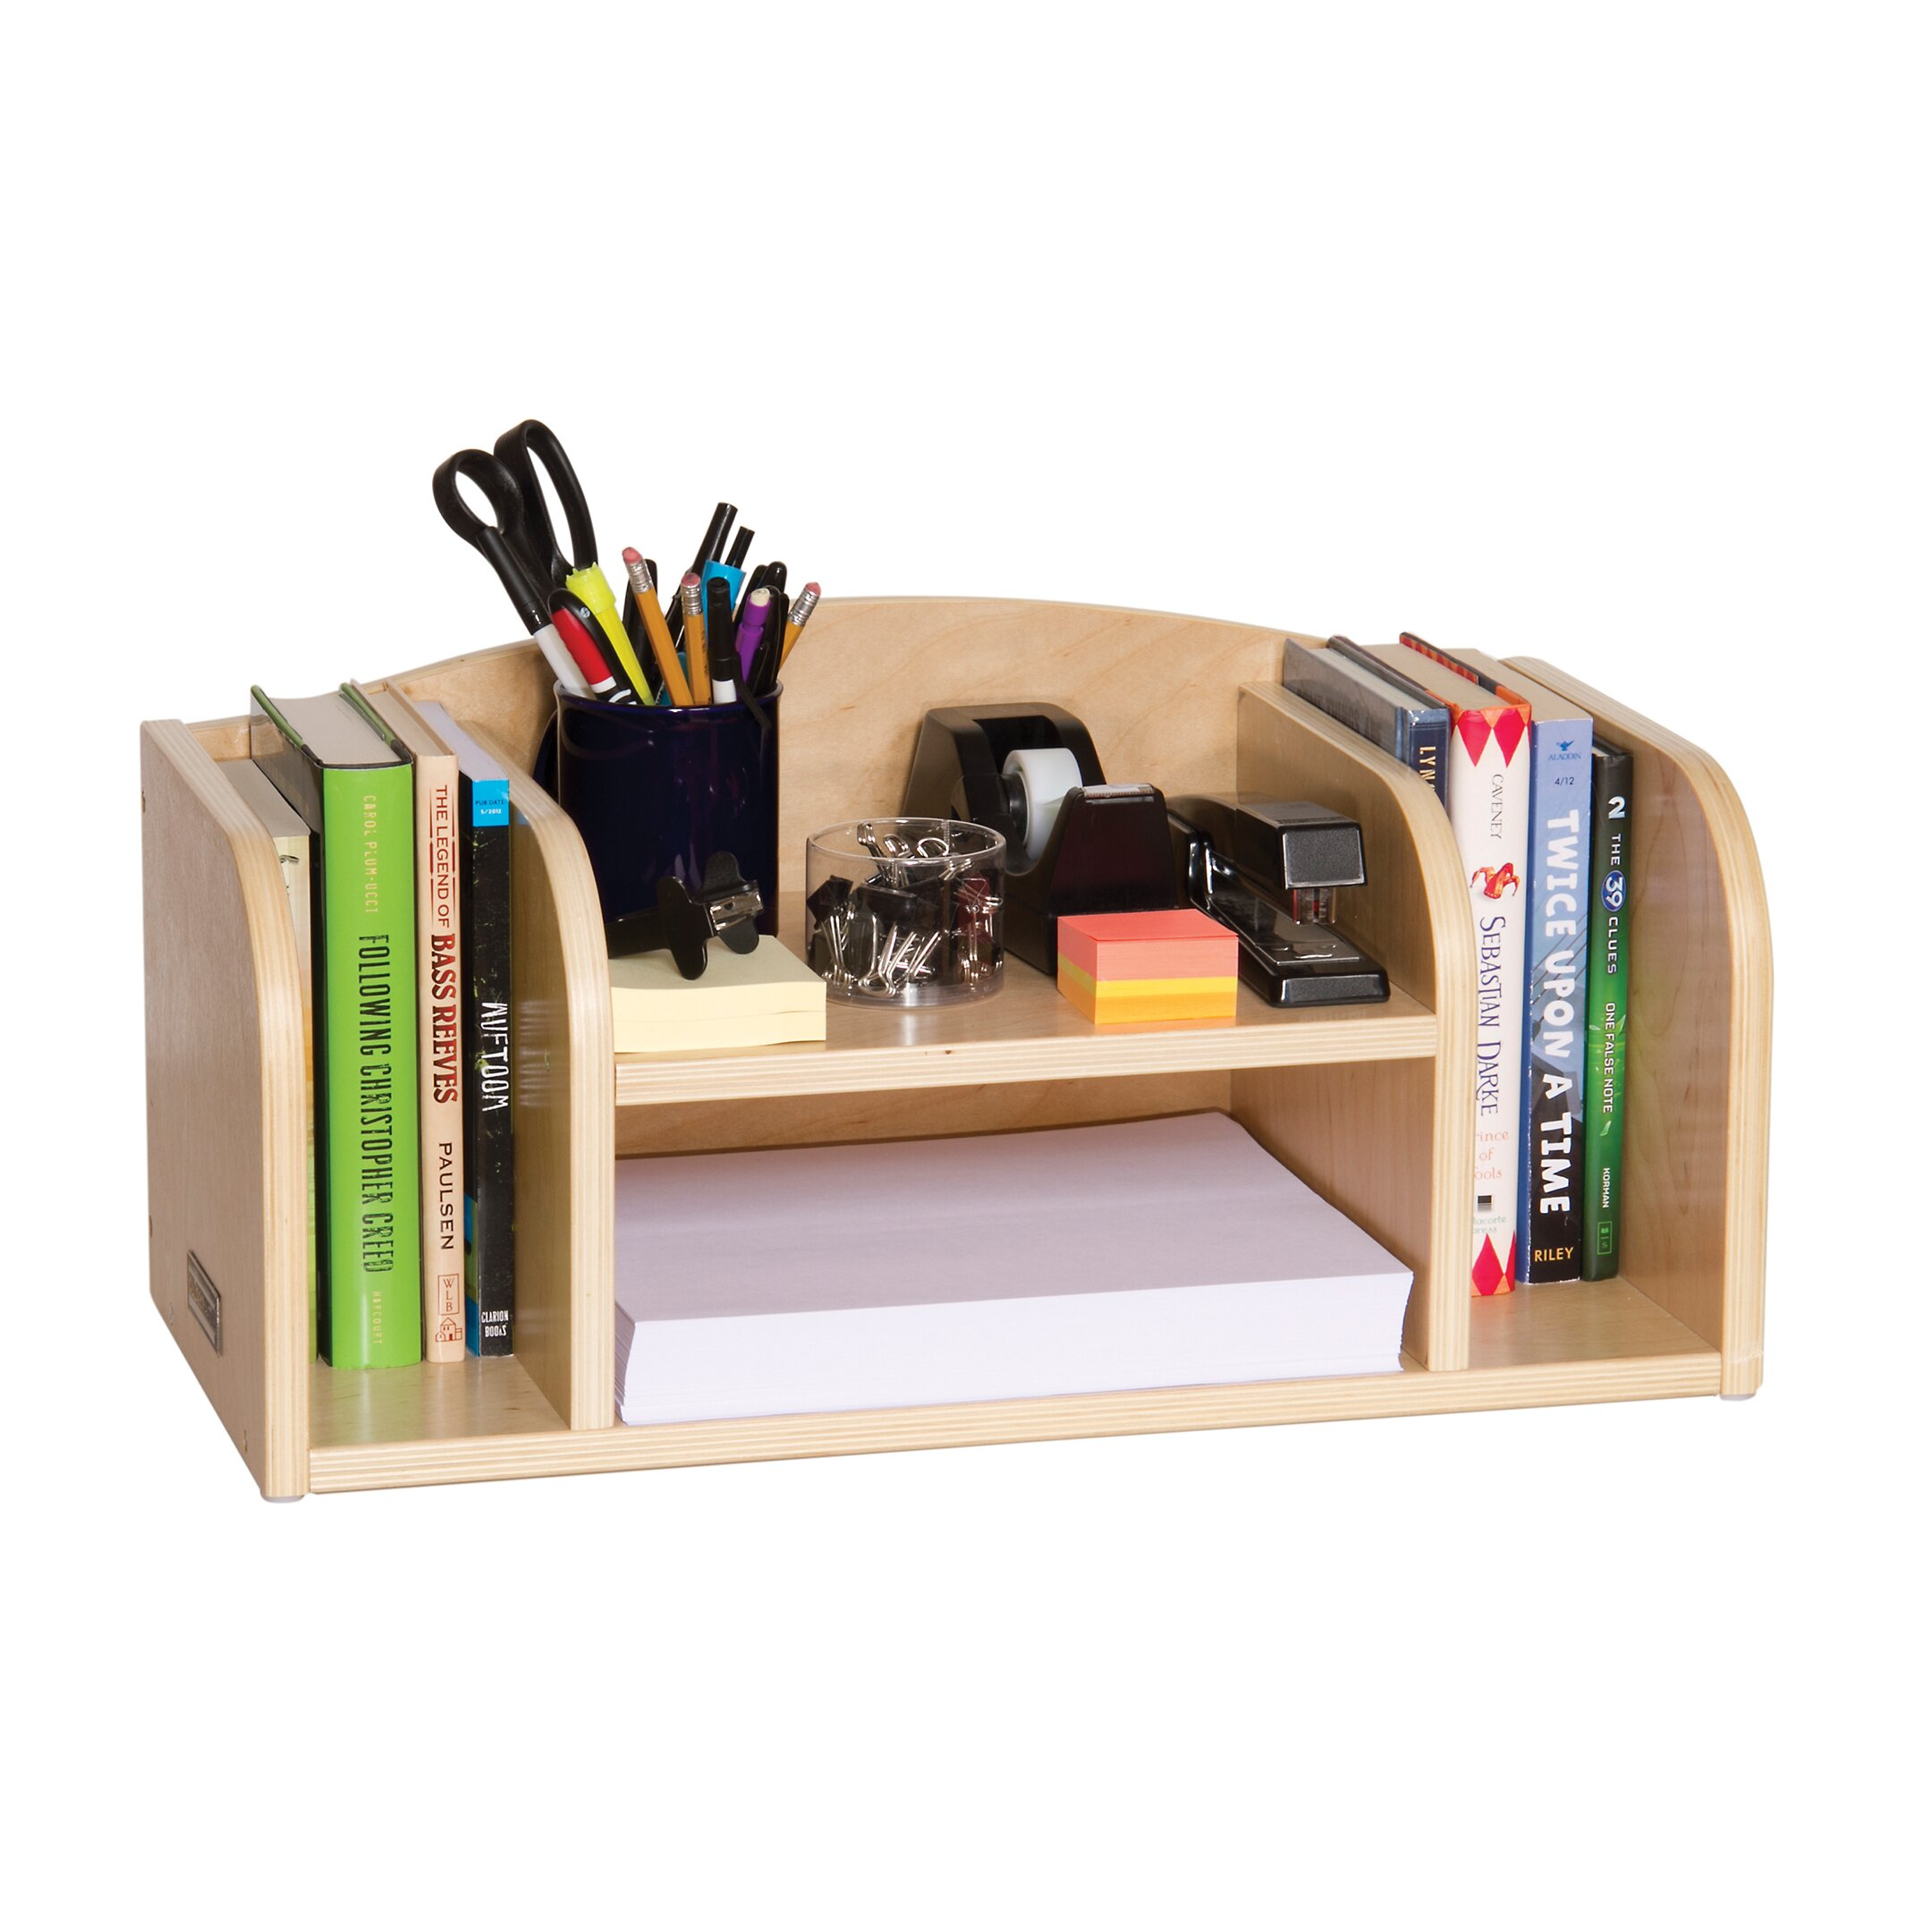 Guidecraft classroom furniture low desk organizer - Glass desk organizer ...